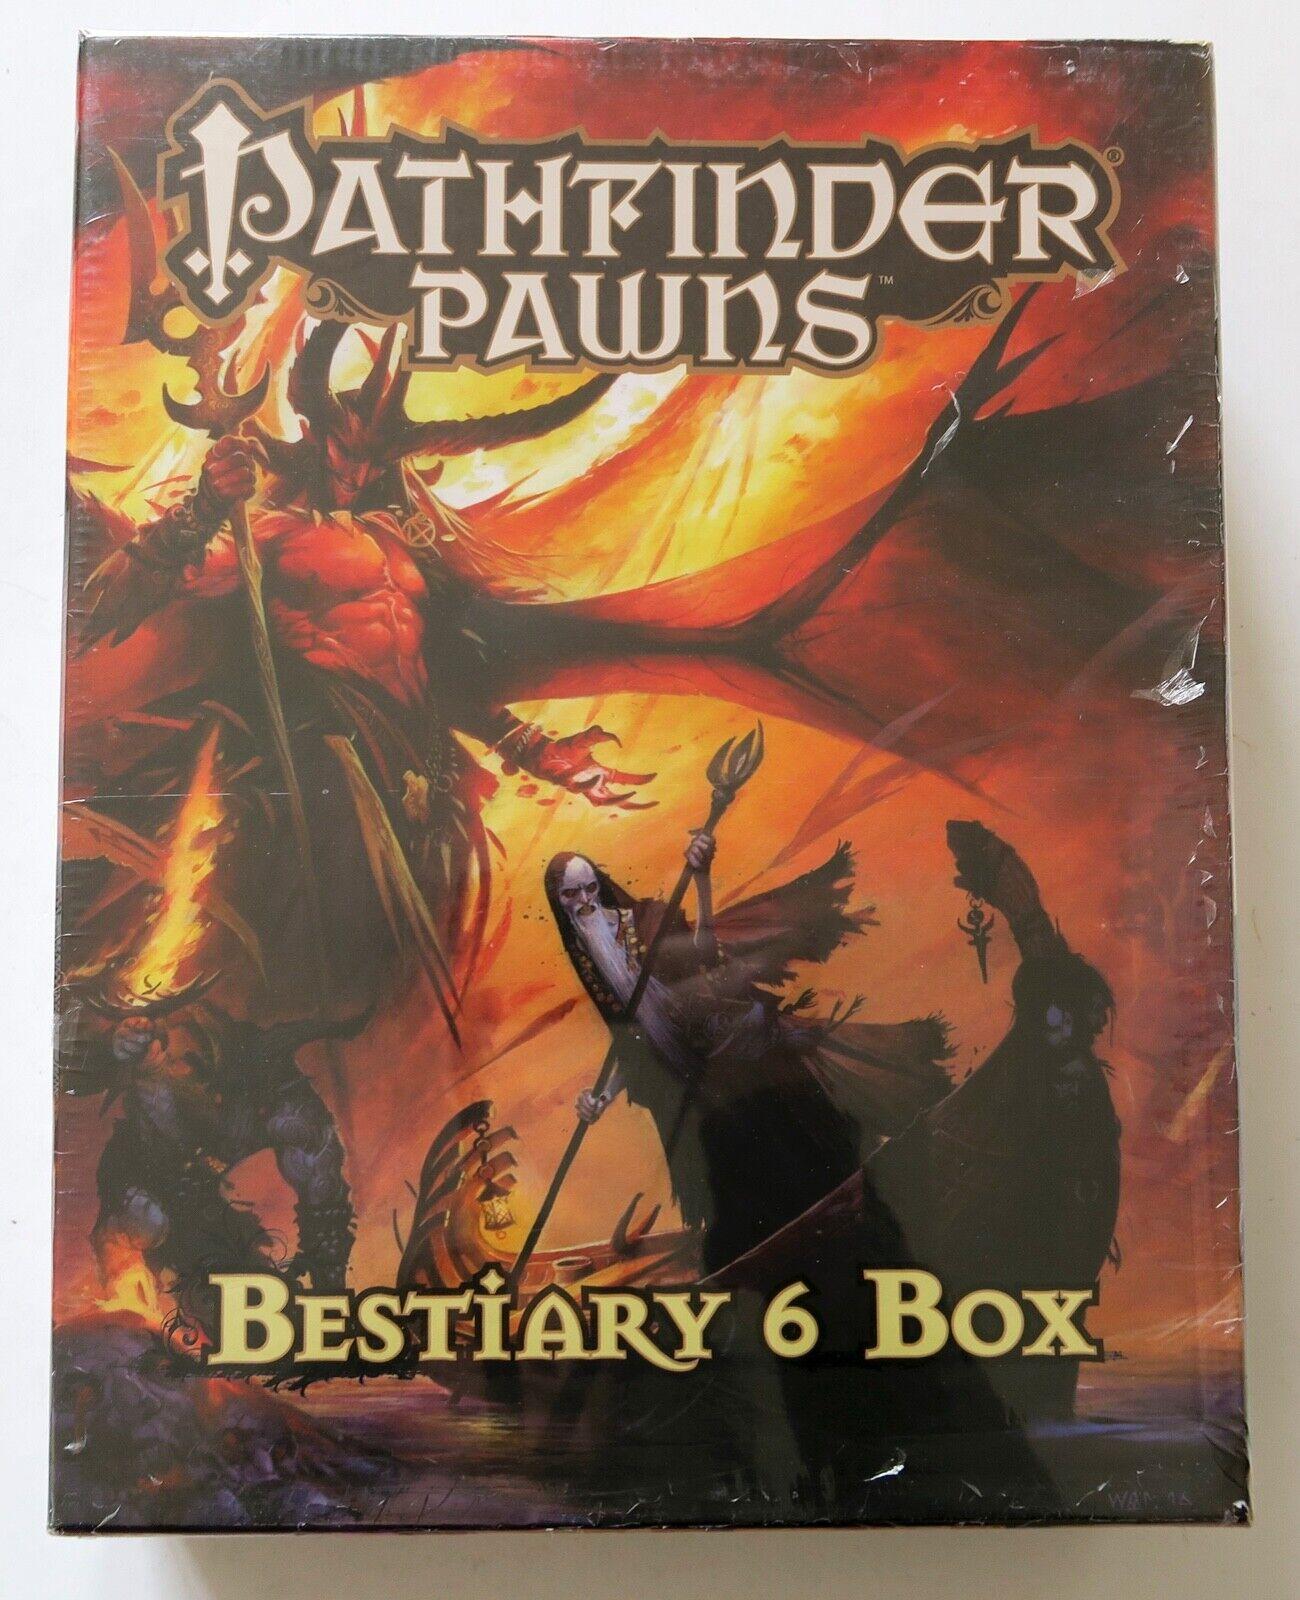 Pathfinder Pawns Pawns Pawns Bestiary 6 Box Roleplaying Game RPG Paizo f17399